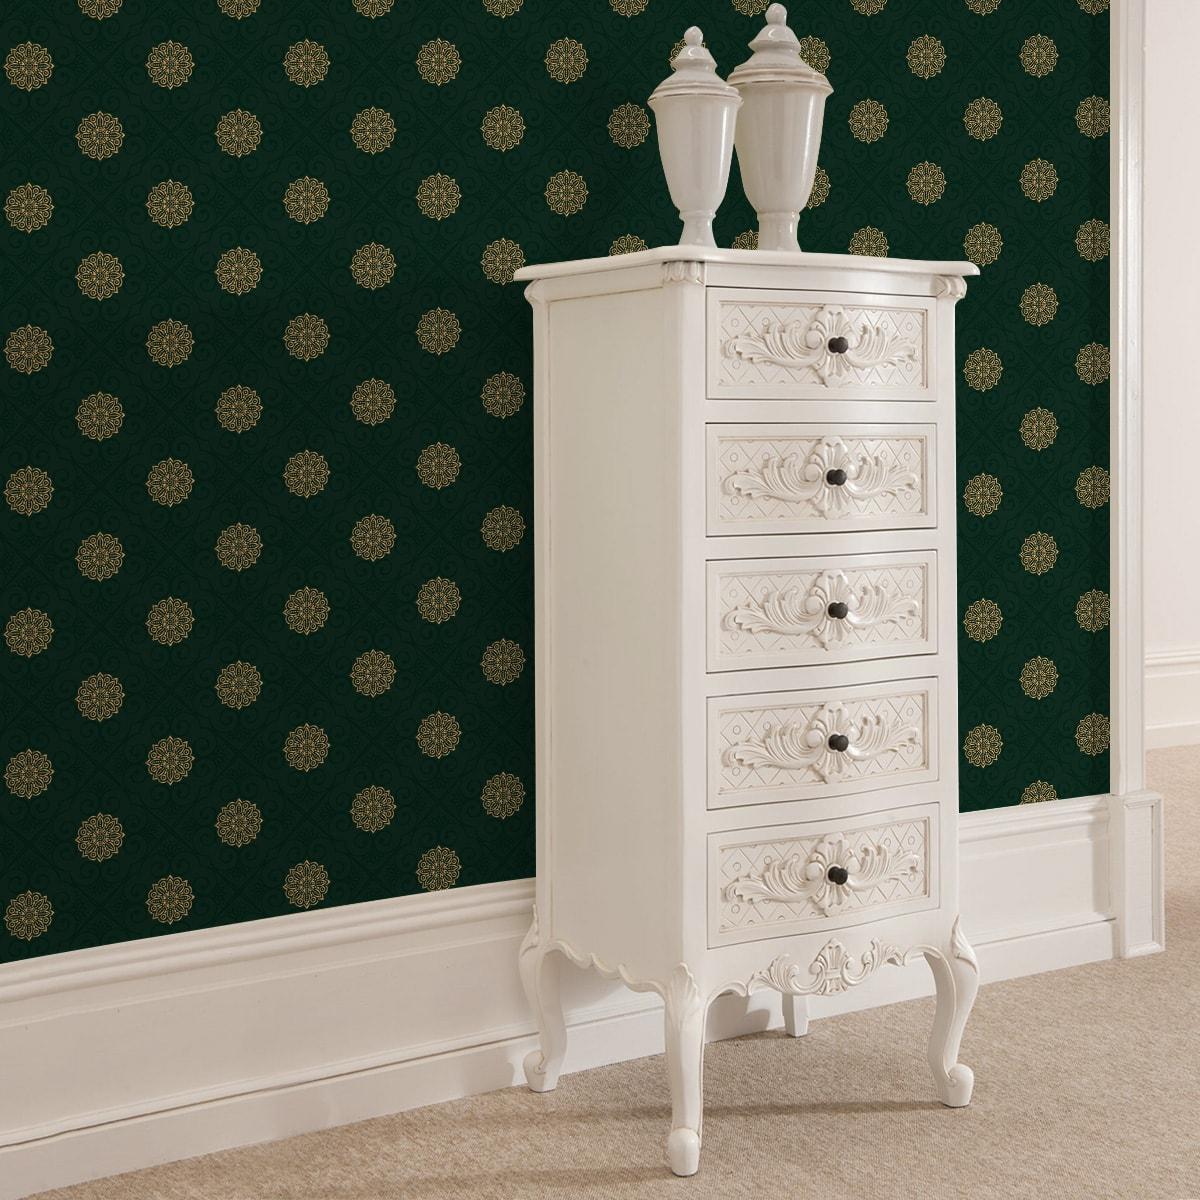 "Dunkel grüne oriental Tapete ""Mandarin"", exklusive Vlies Tapete Ornamenttapete für Flur, Büro"